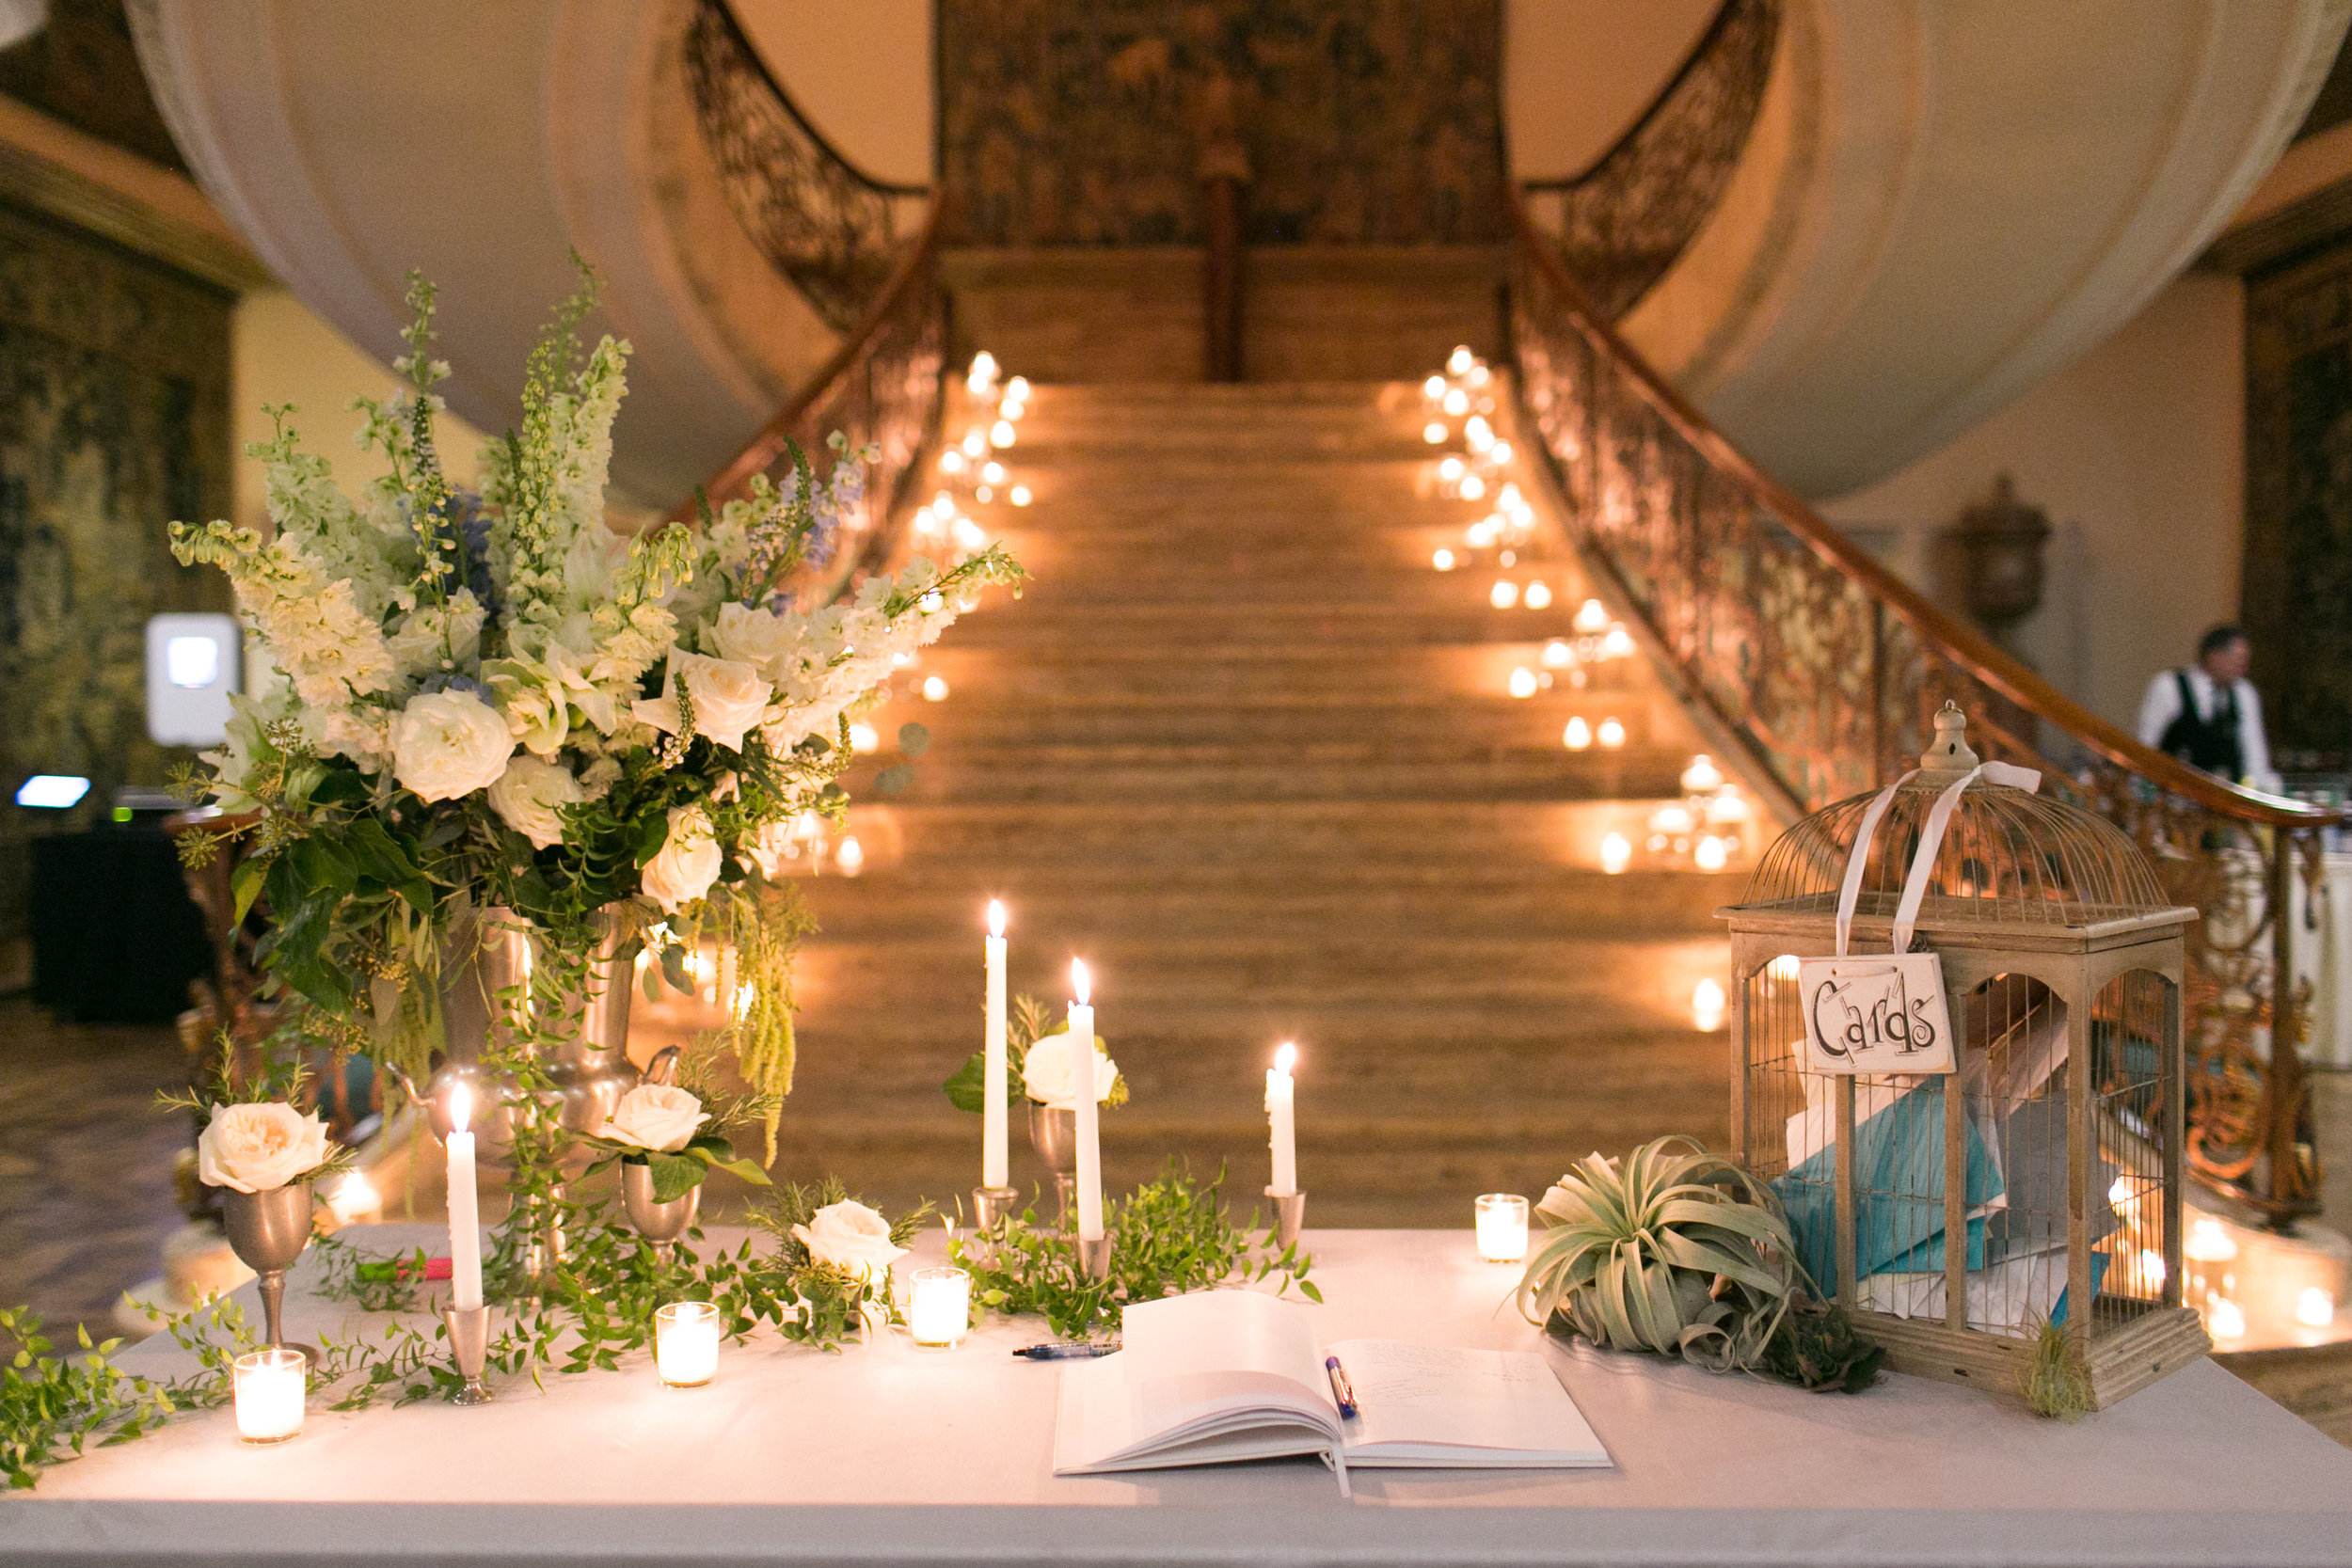 NJ Wedding, Seating Chart, Seating Assignments, Wedding Inspo, A Garden Party, Jasna Polna, Princeton Wedding